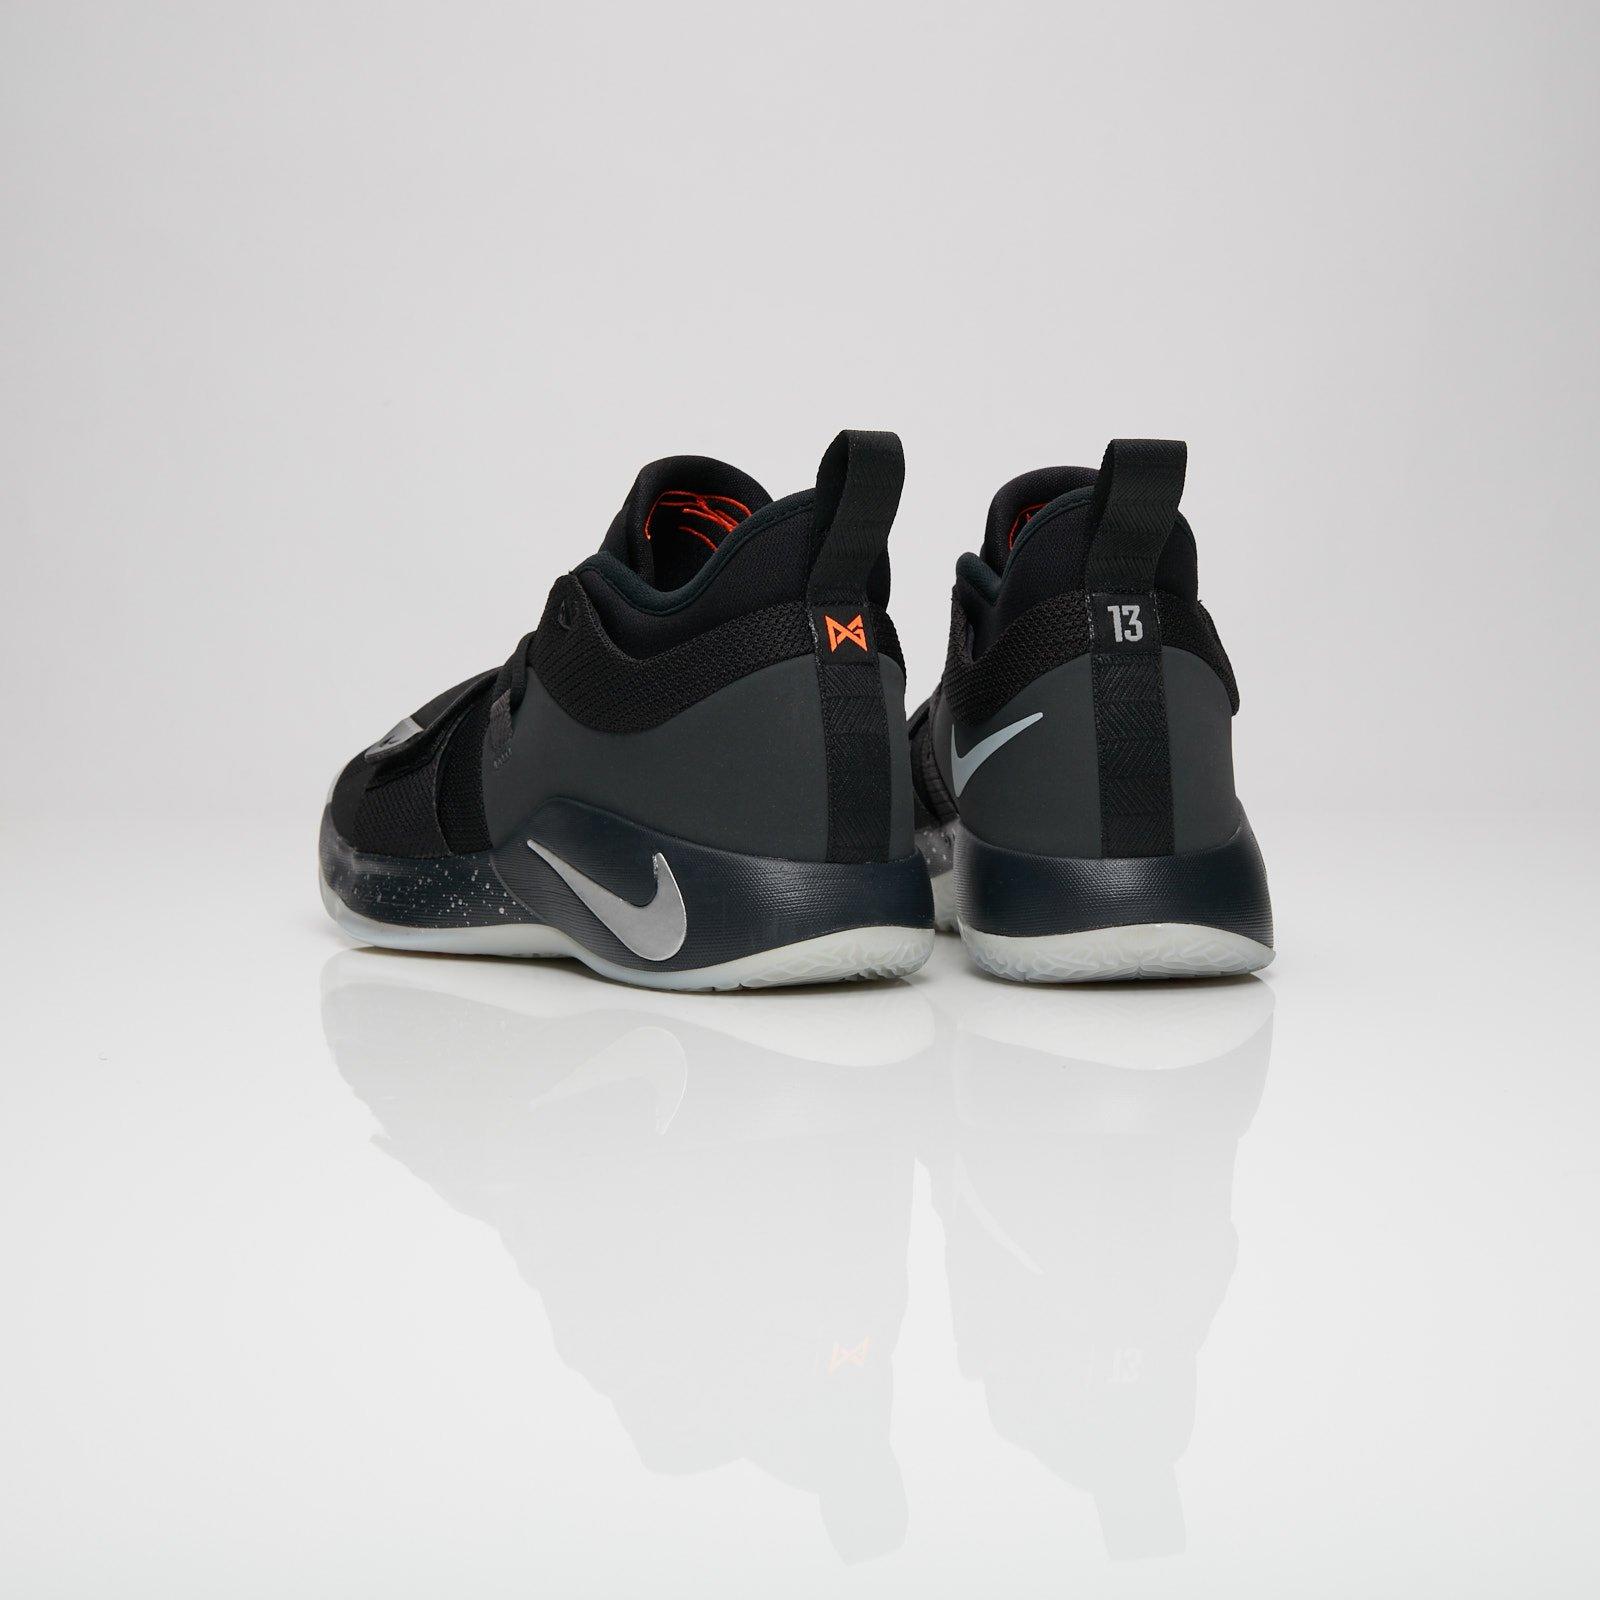 817bb42de0e4 Nike PG 2.5 - Bq8452-004 - Sneakersnstuff